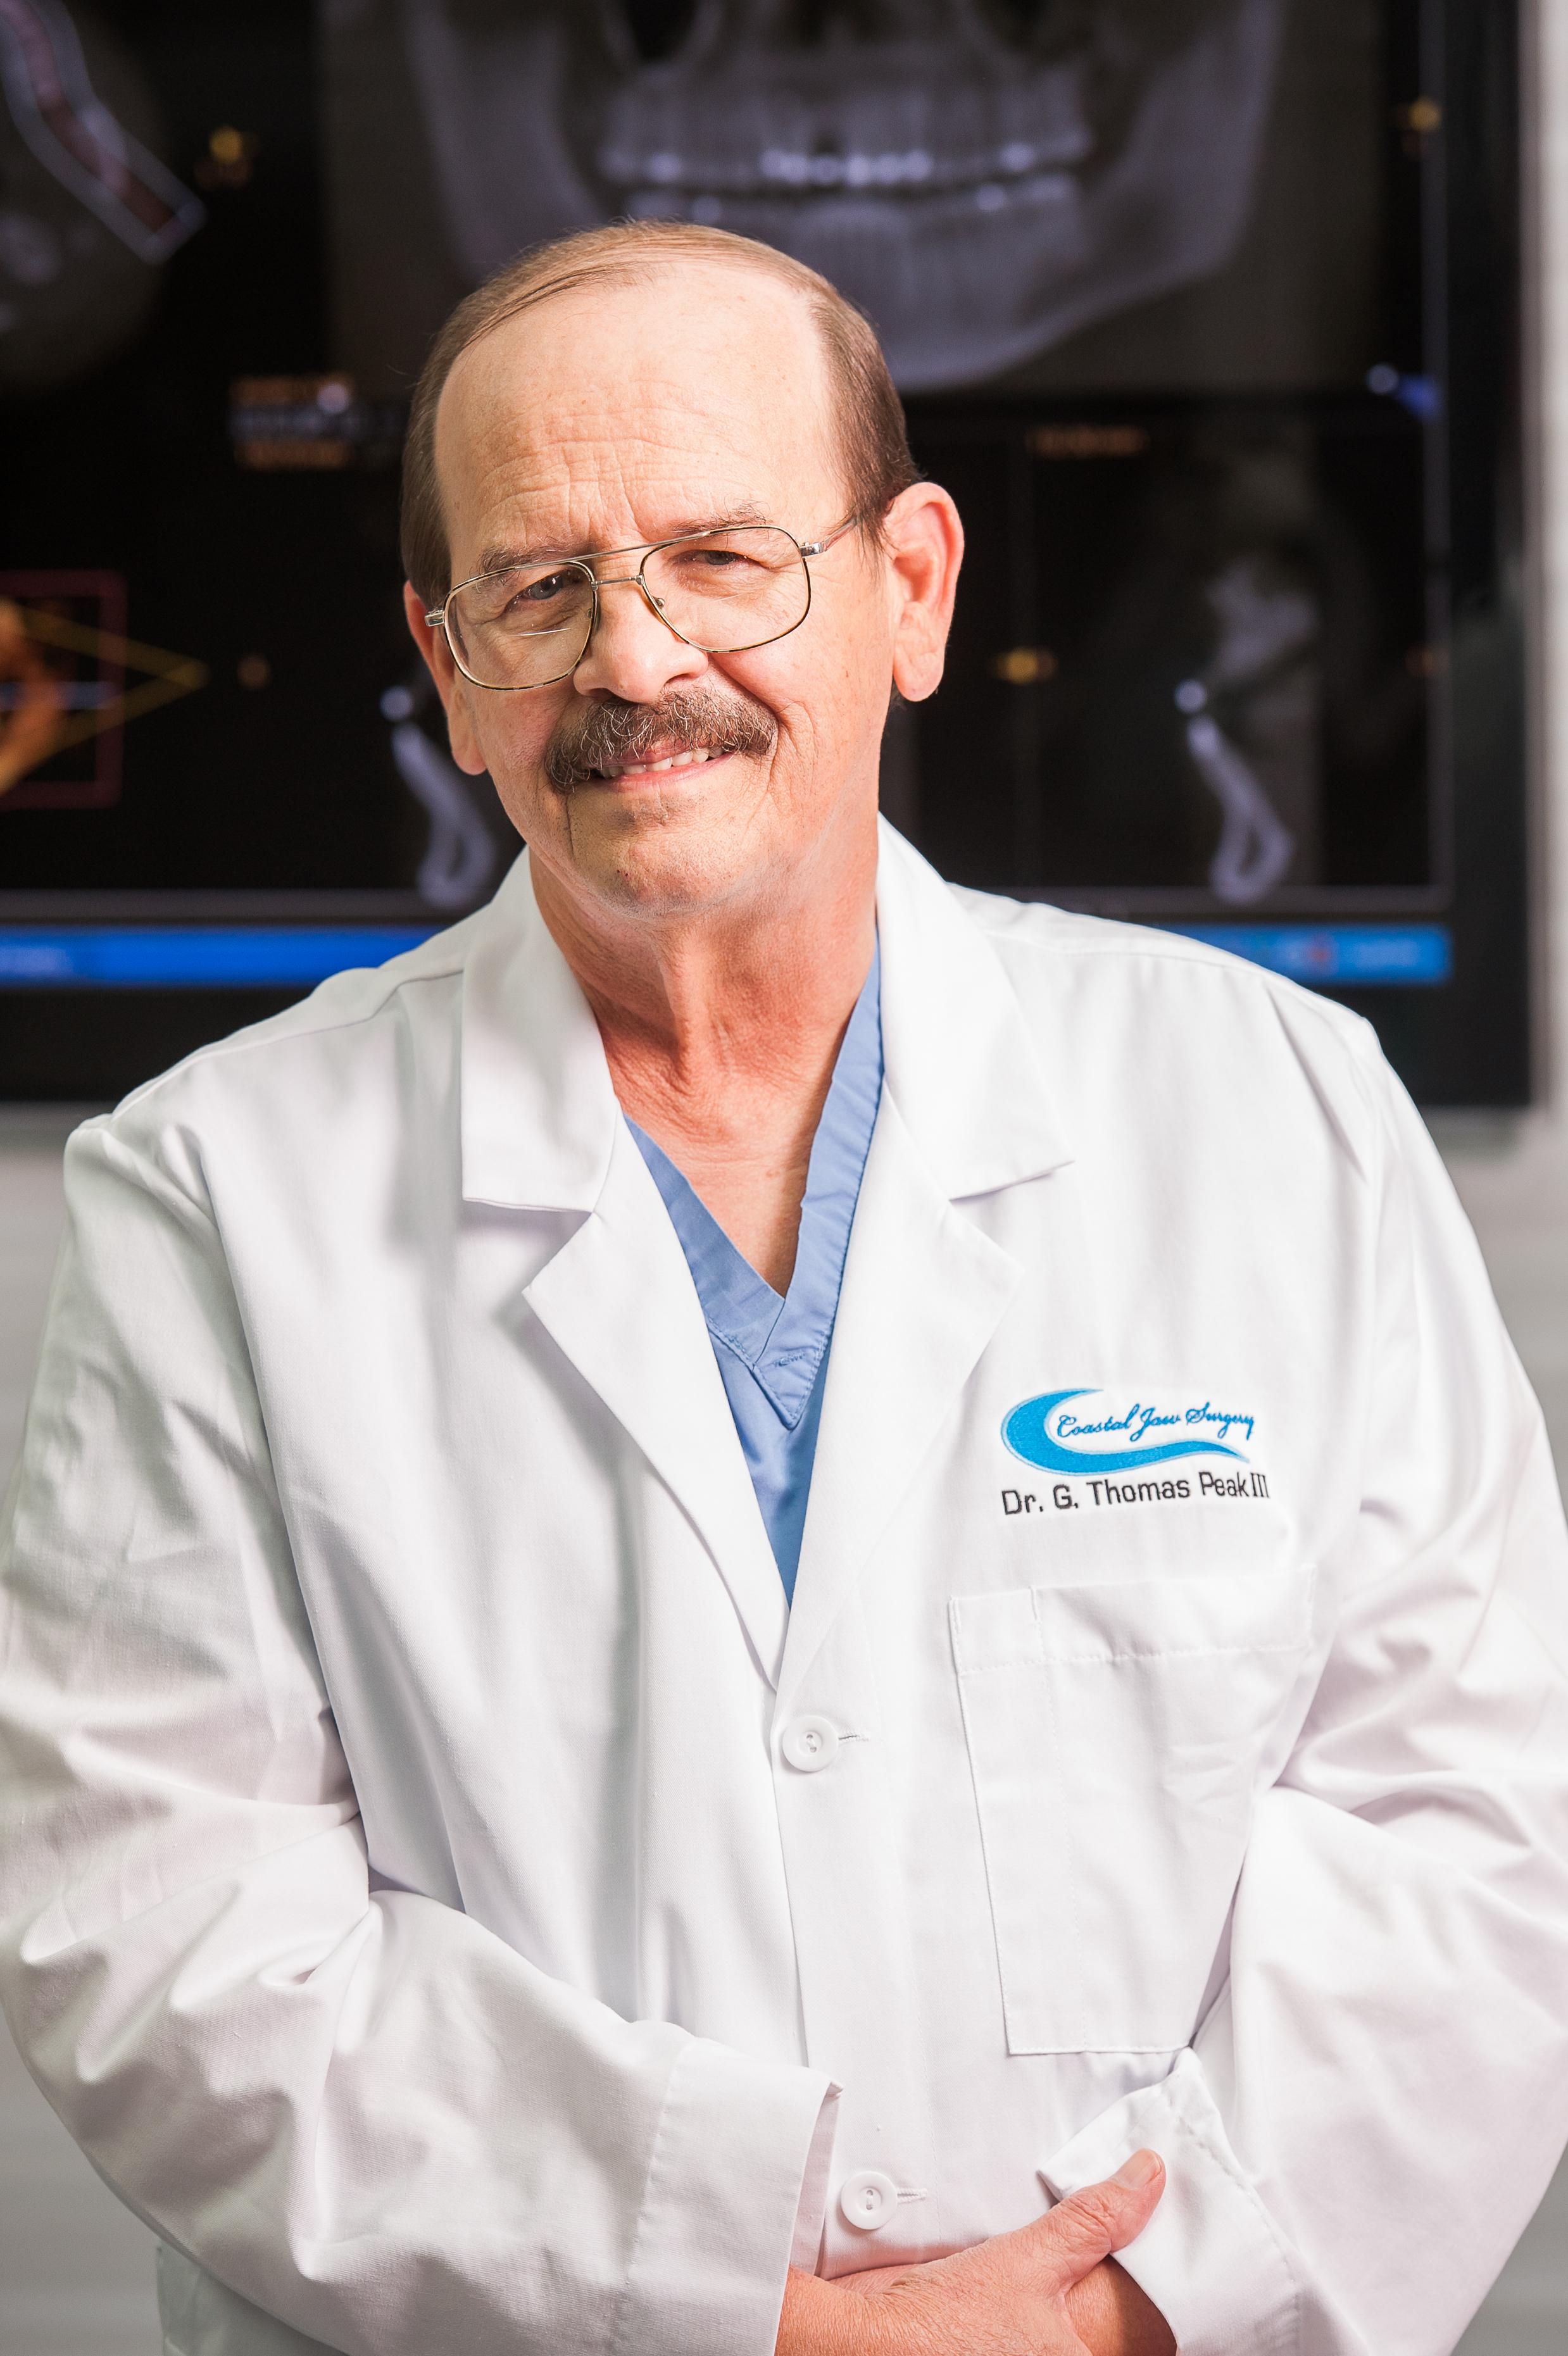 Dr. G. Thomas Peak, III